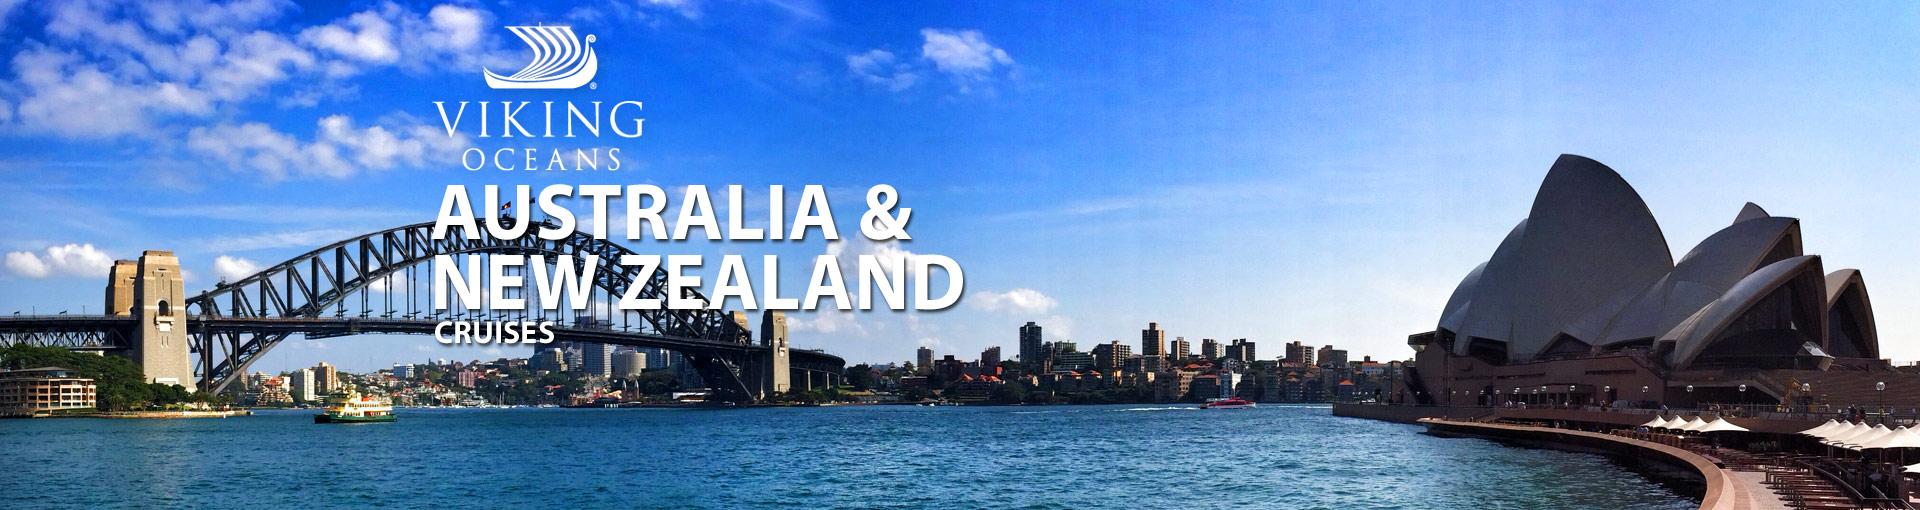 Viking Oceans Australia and New Zealand Cruises